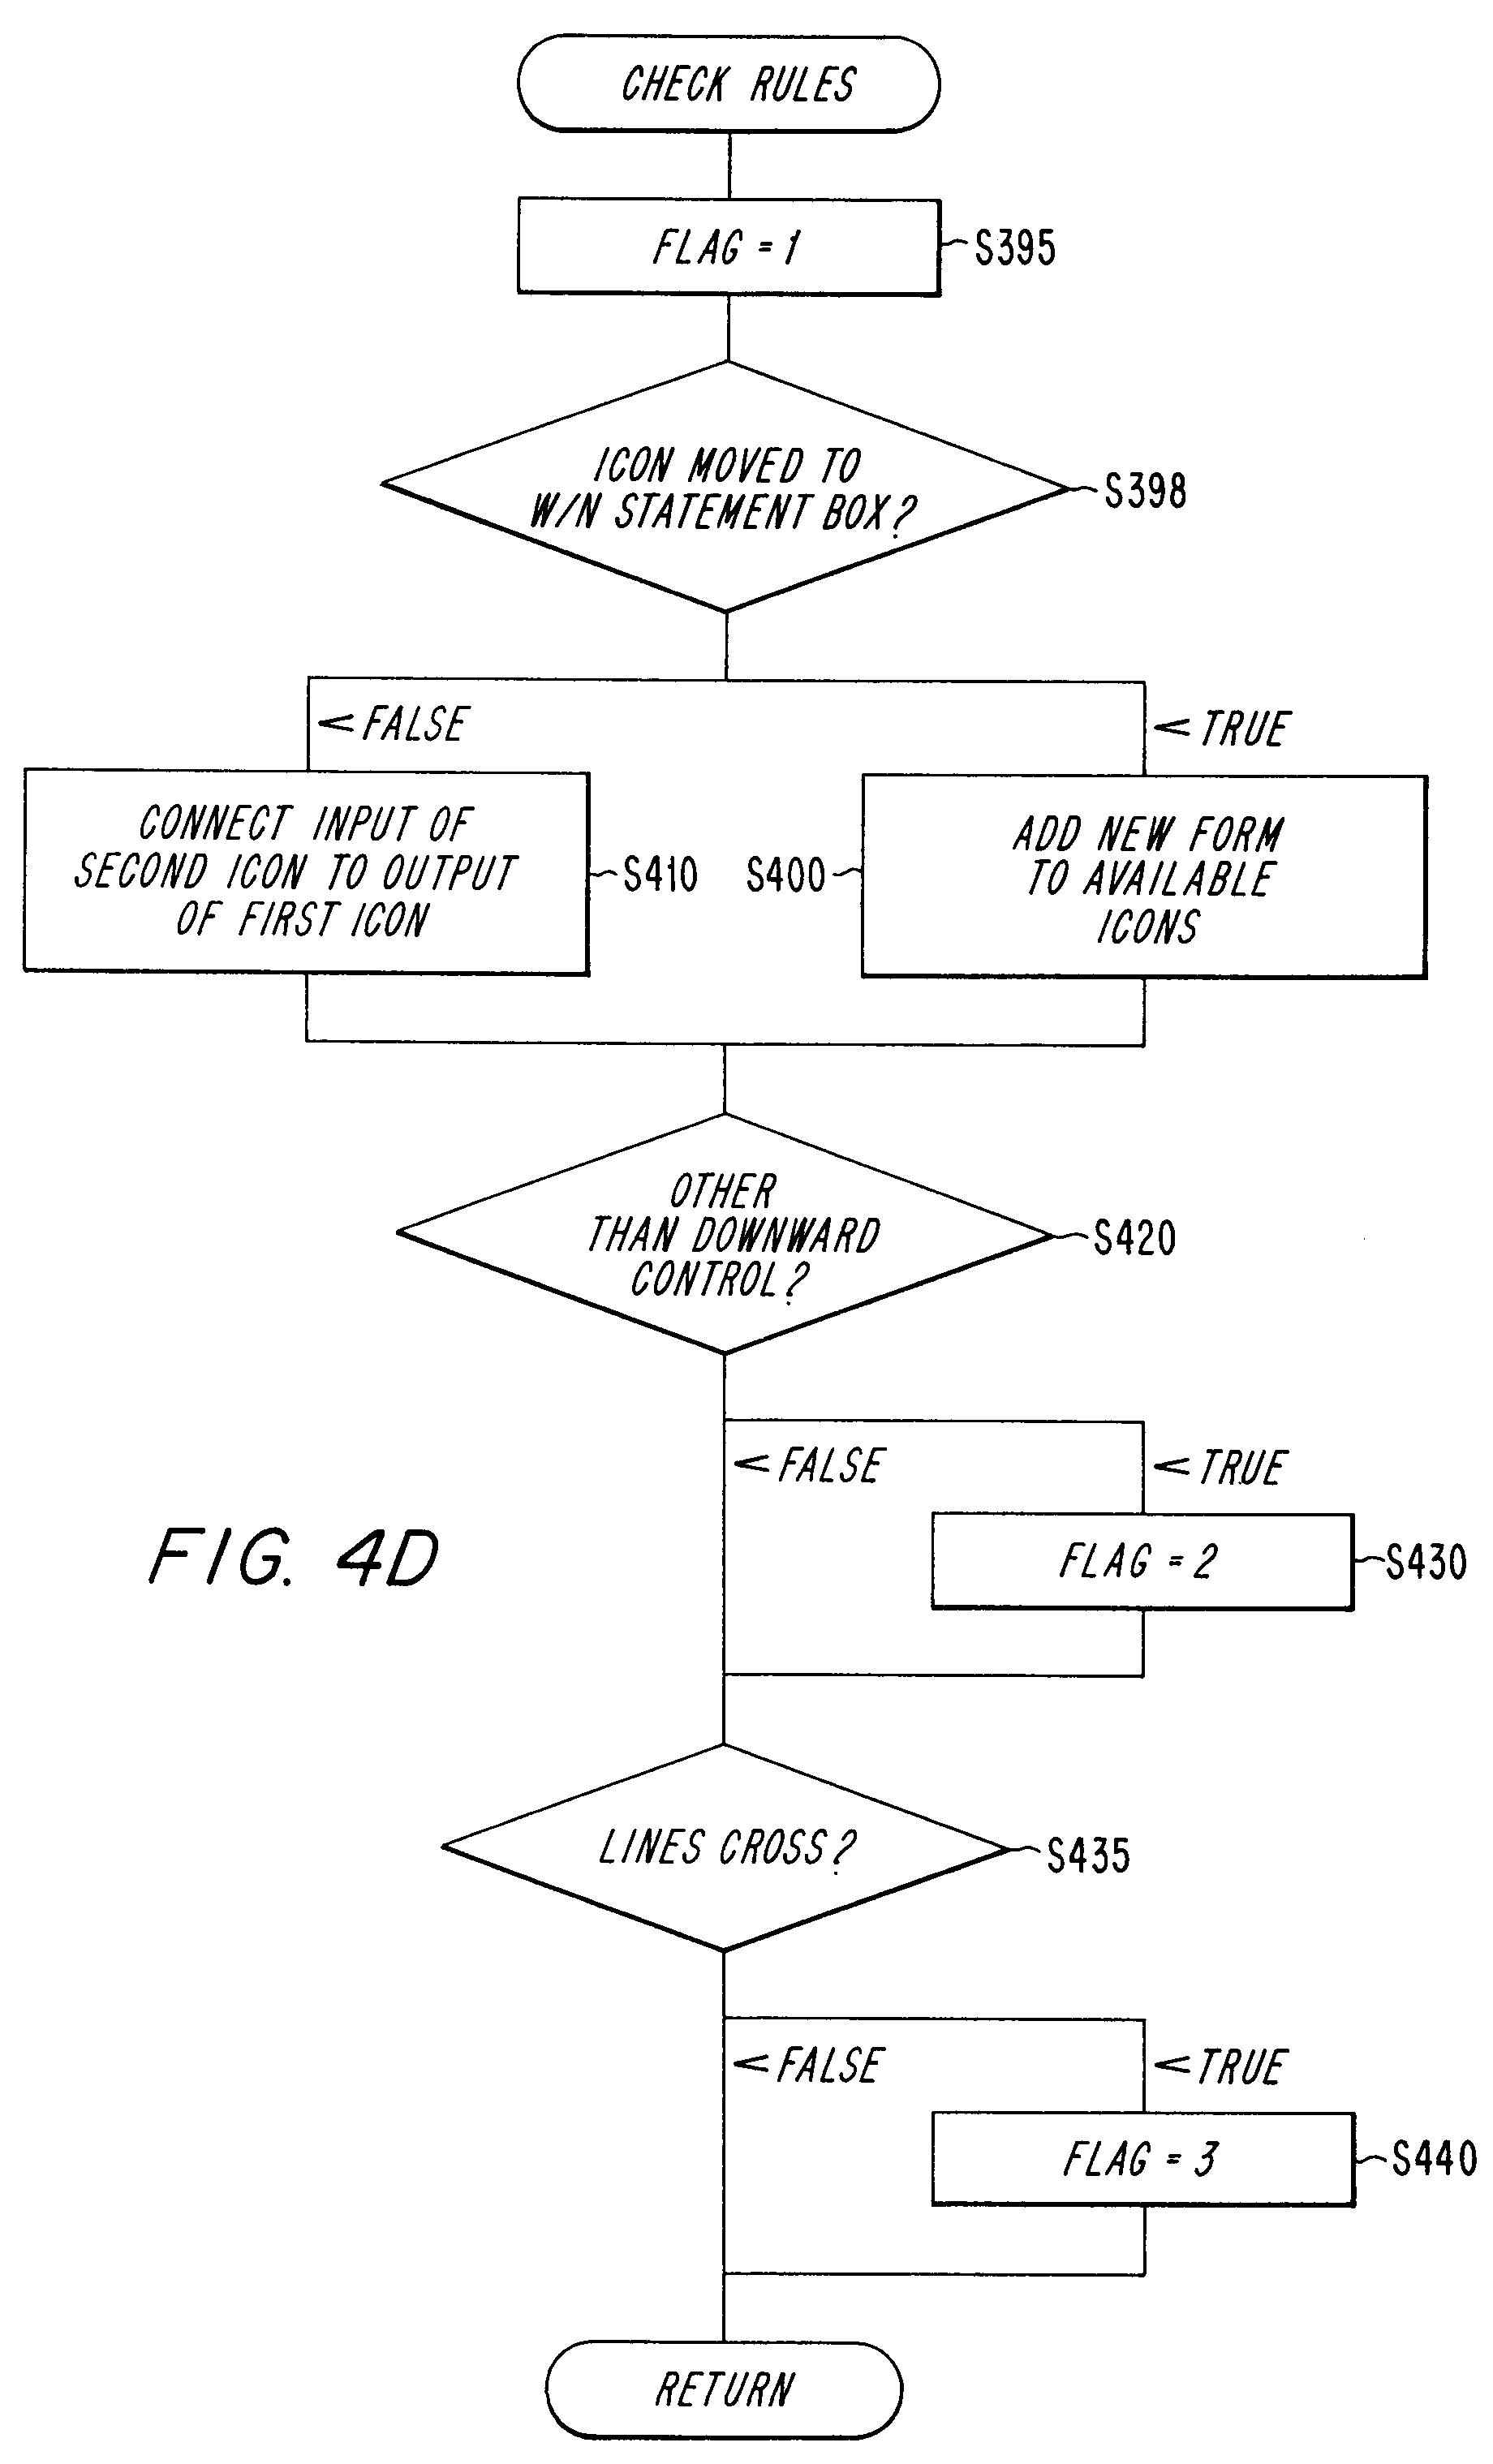 Flowchart of switch statement create a flowchart winnings flowchart patent drawing case nvjuhfo Gallery